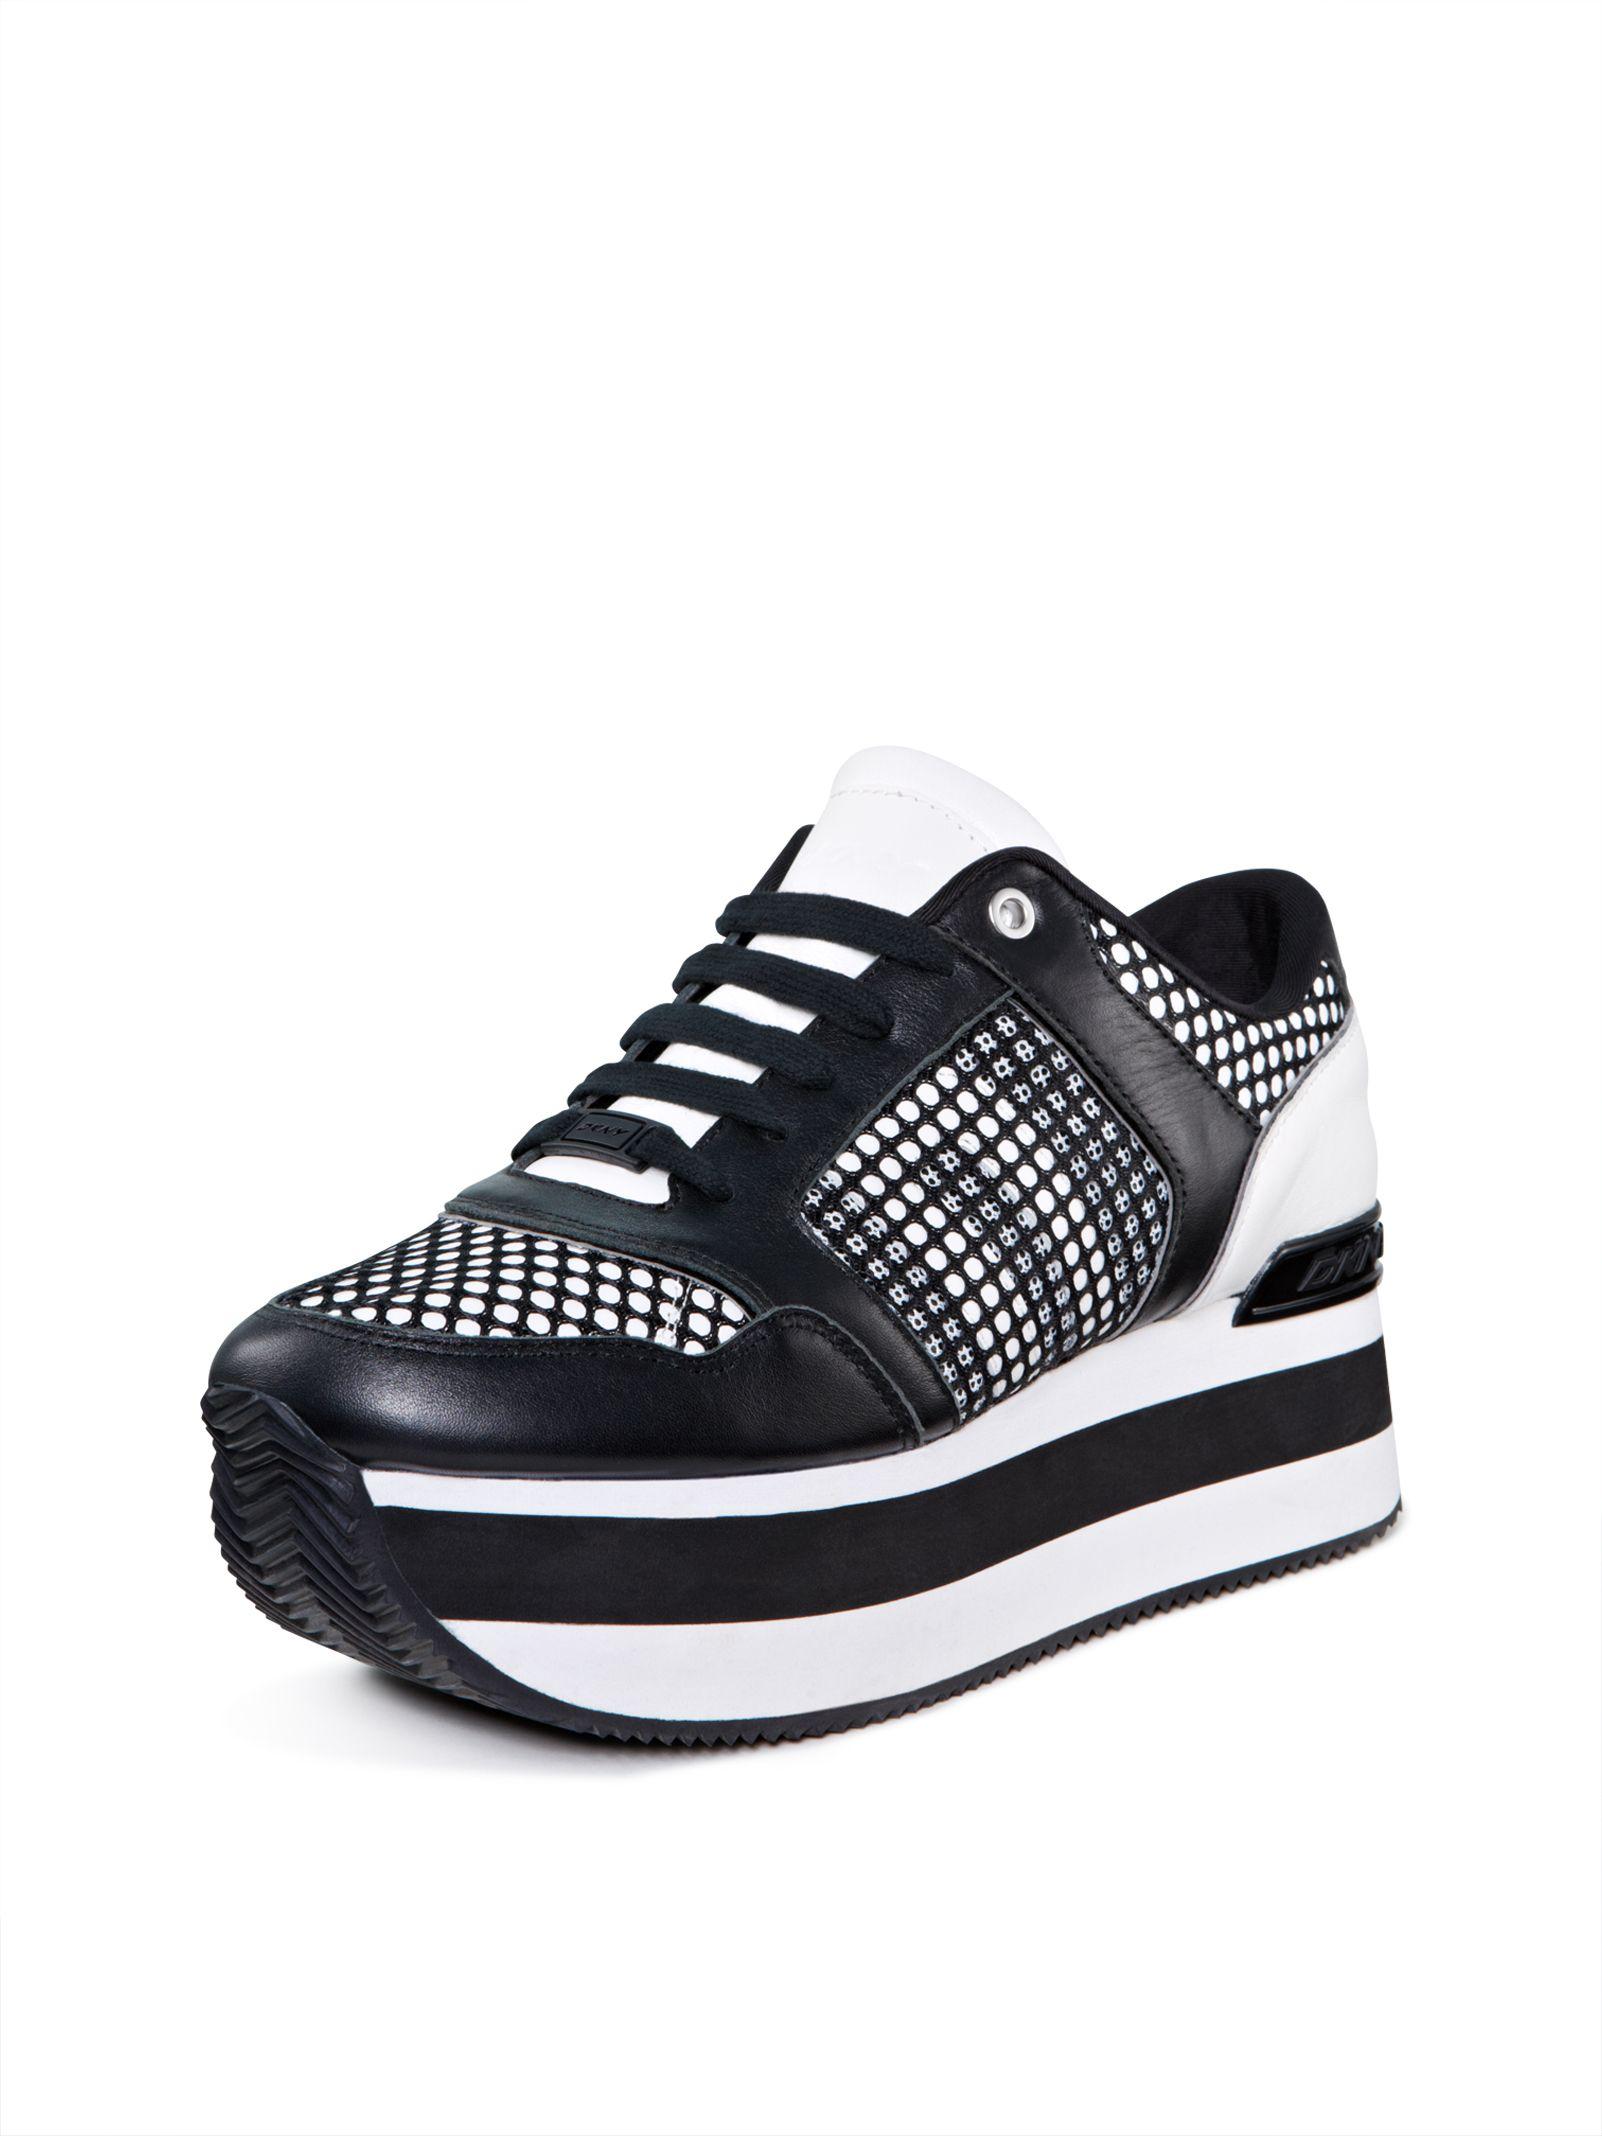 7fb0781eb91 Jill Platform Sneaker, WHITE-BLACK | shopping list | Sneakers ...